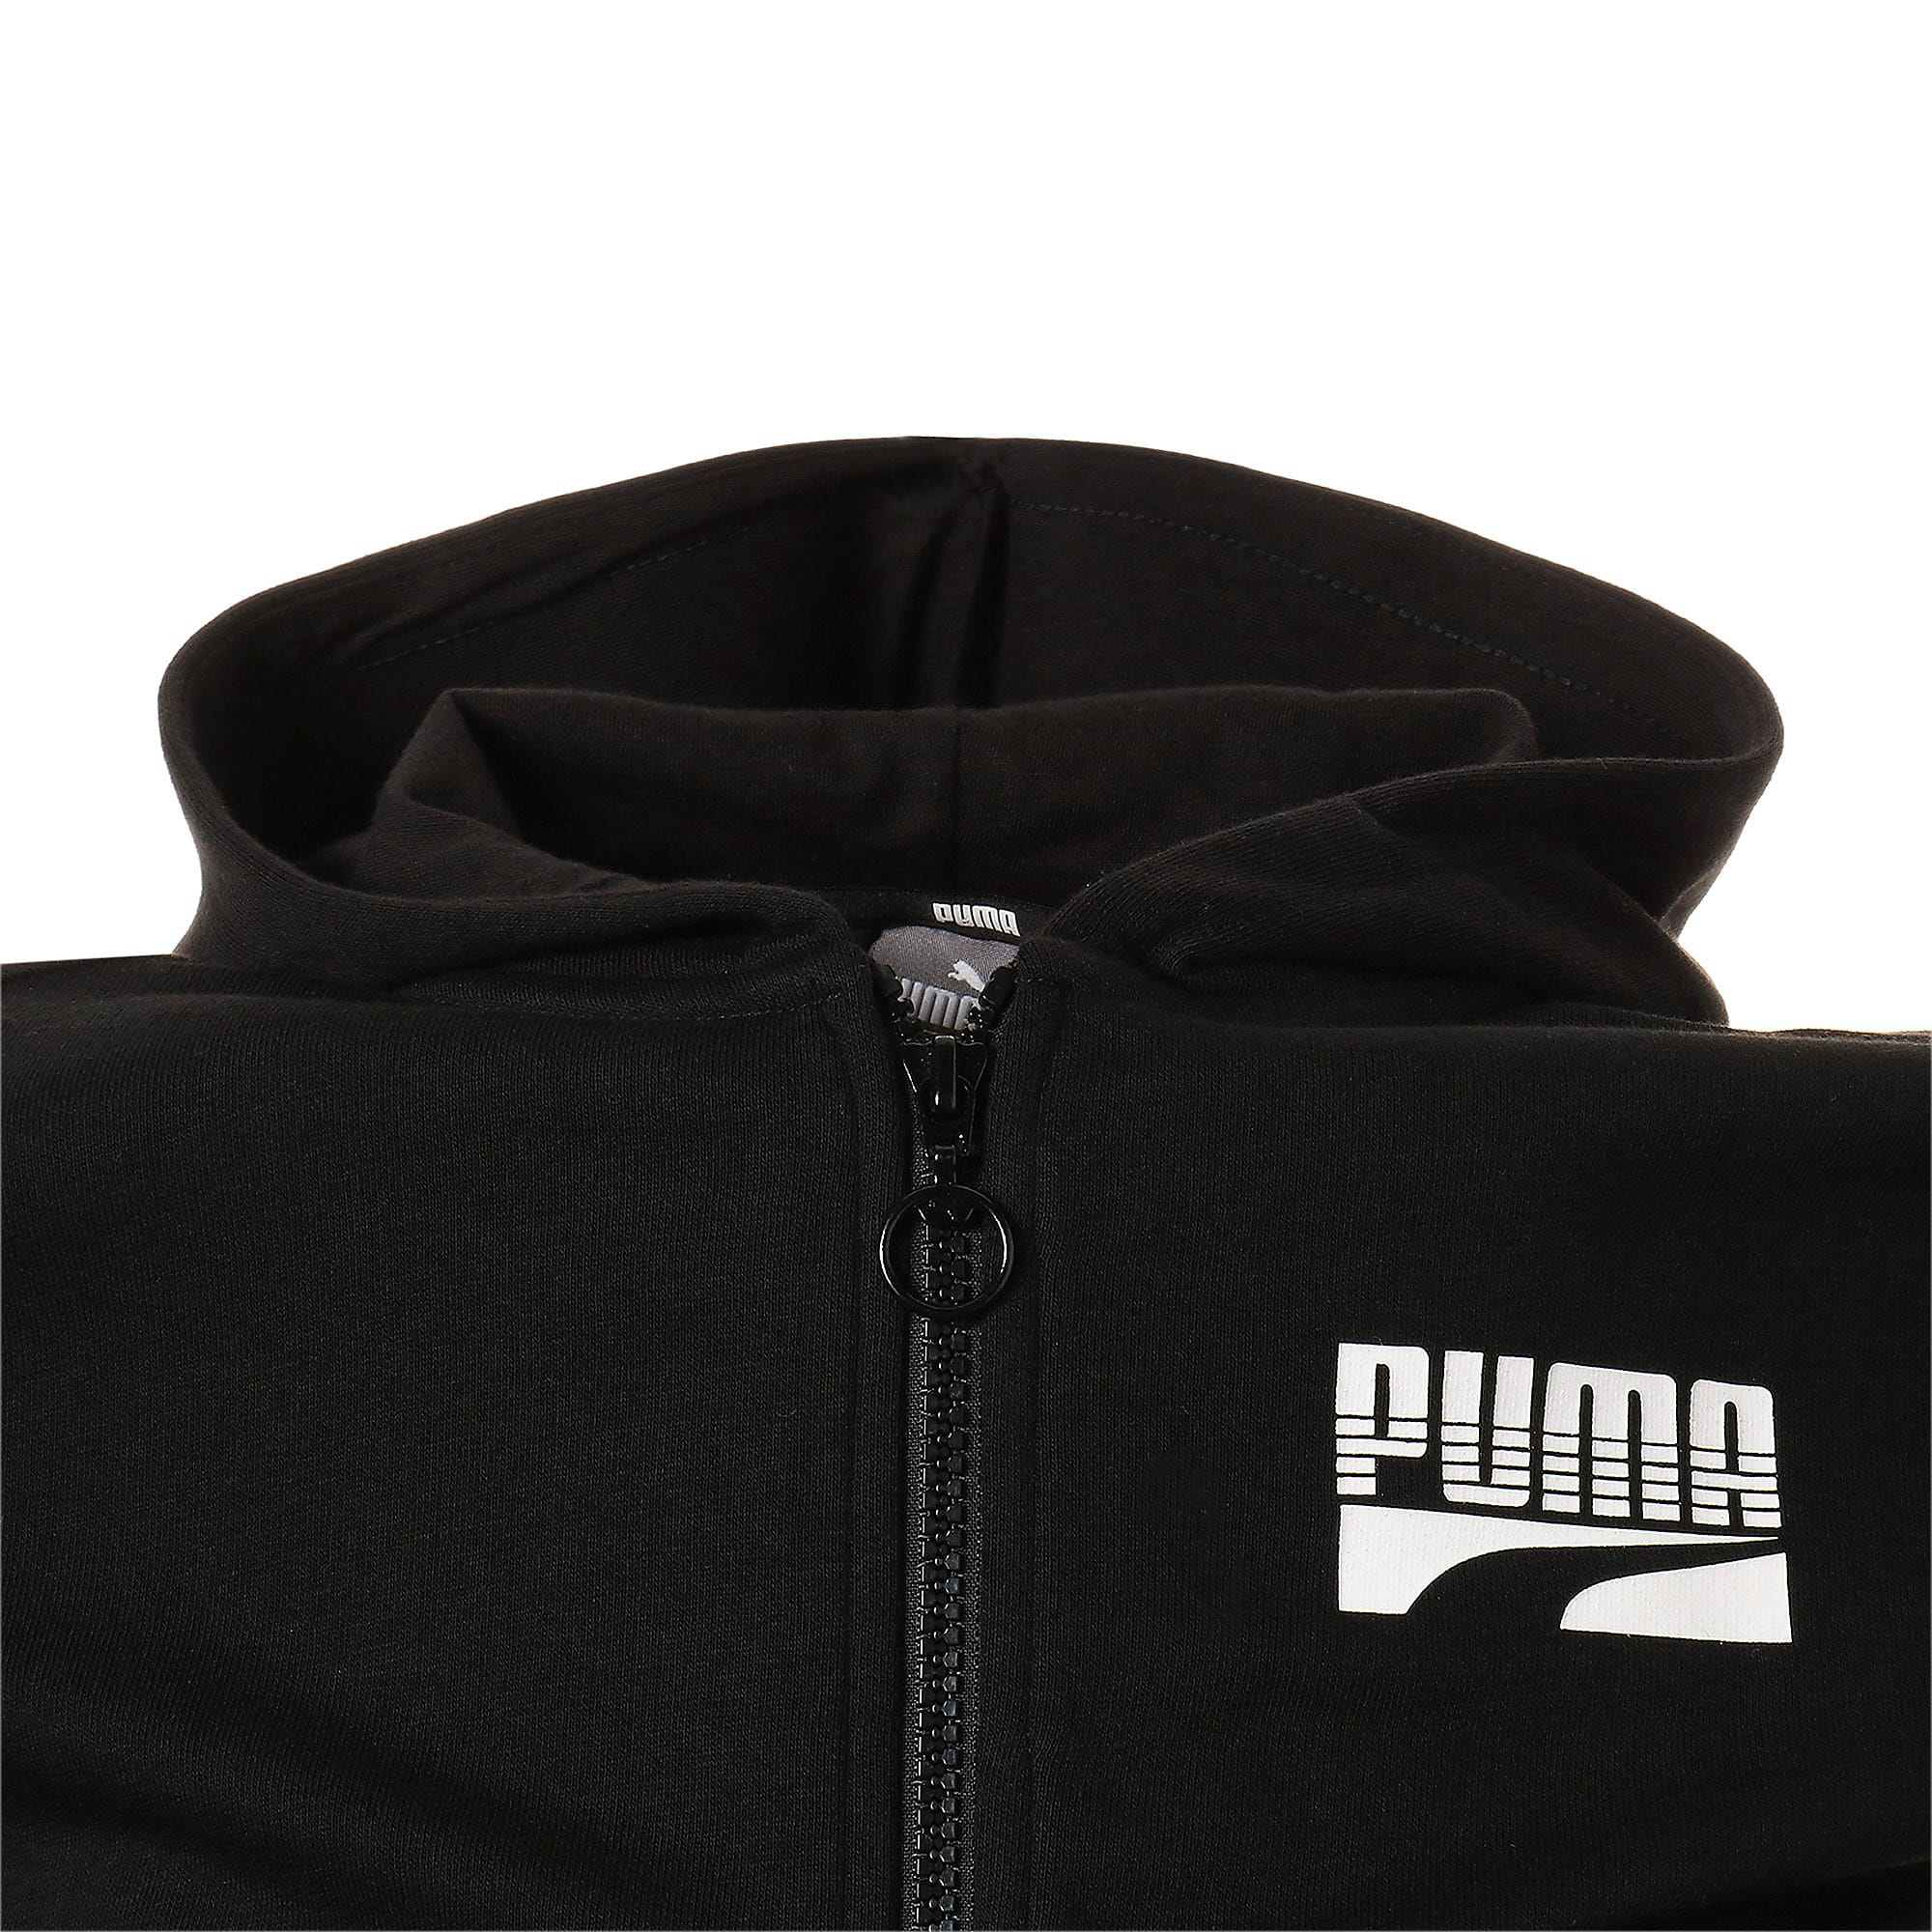 Thumbnail 7 of キッズ REBEL ボールド フルジップTR, Puma Black, medium-JPN